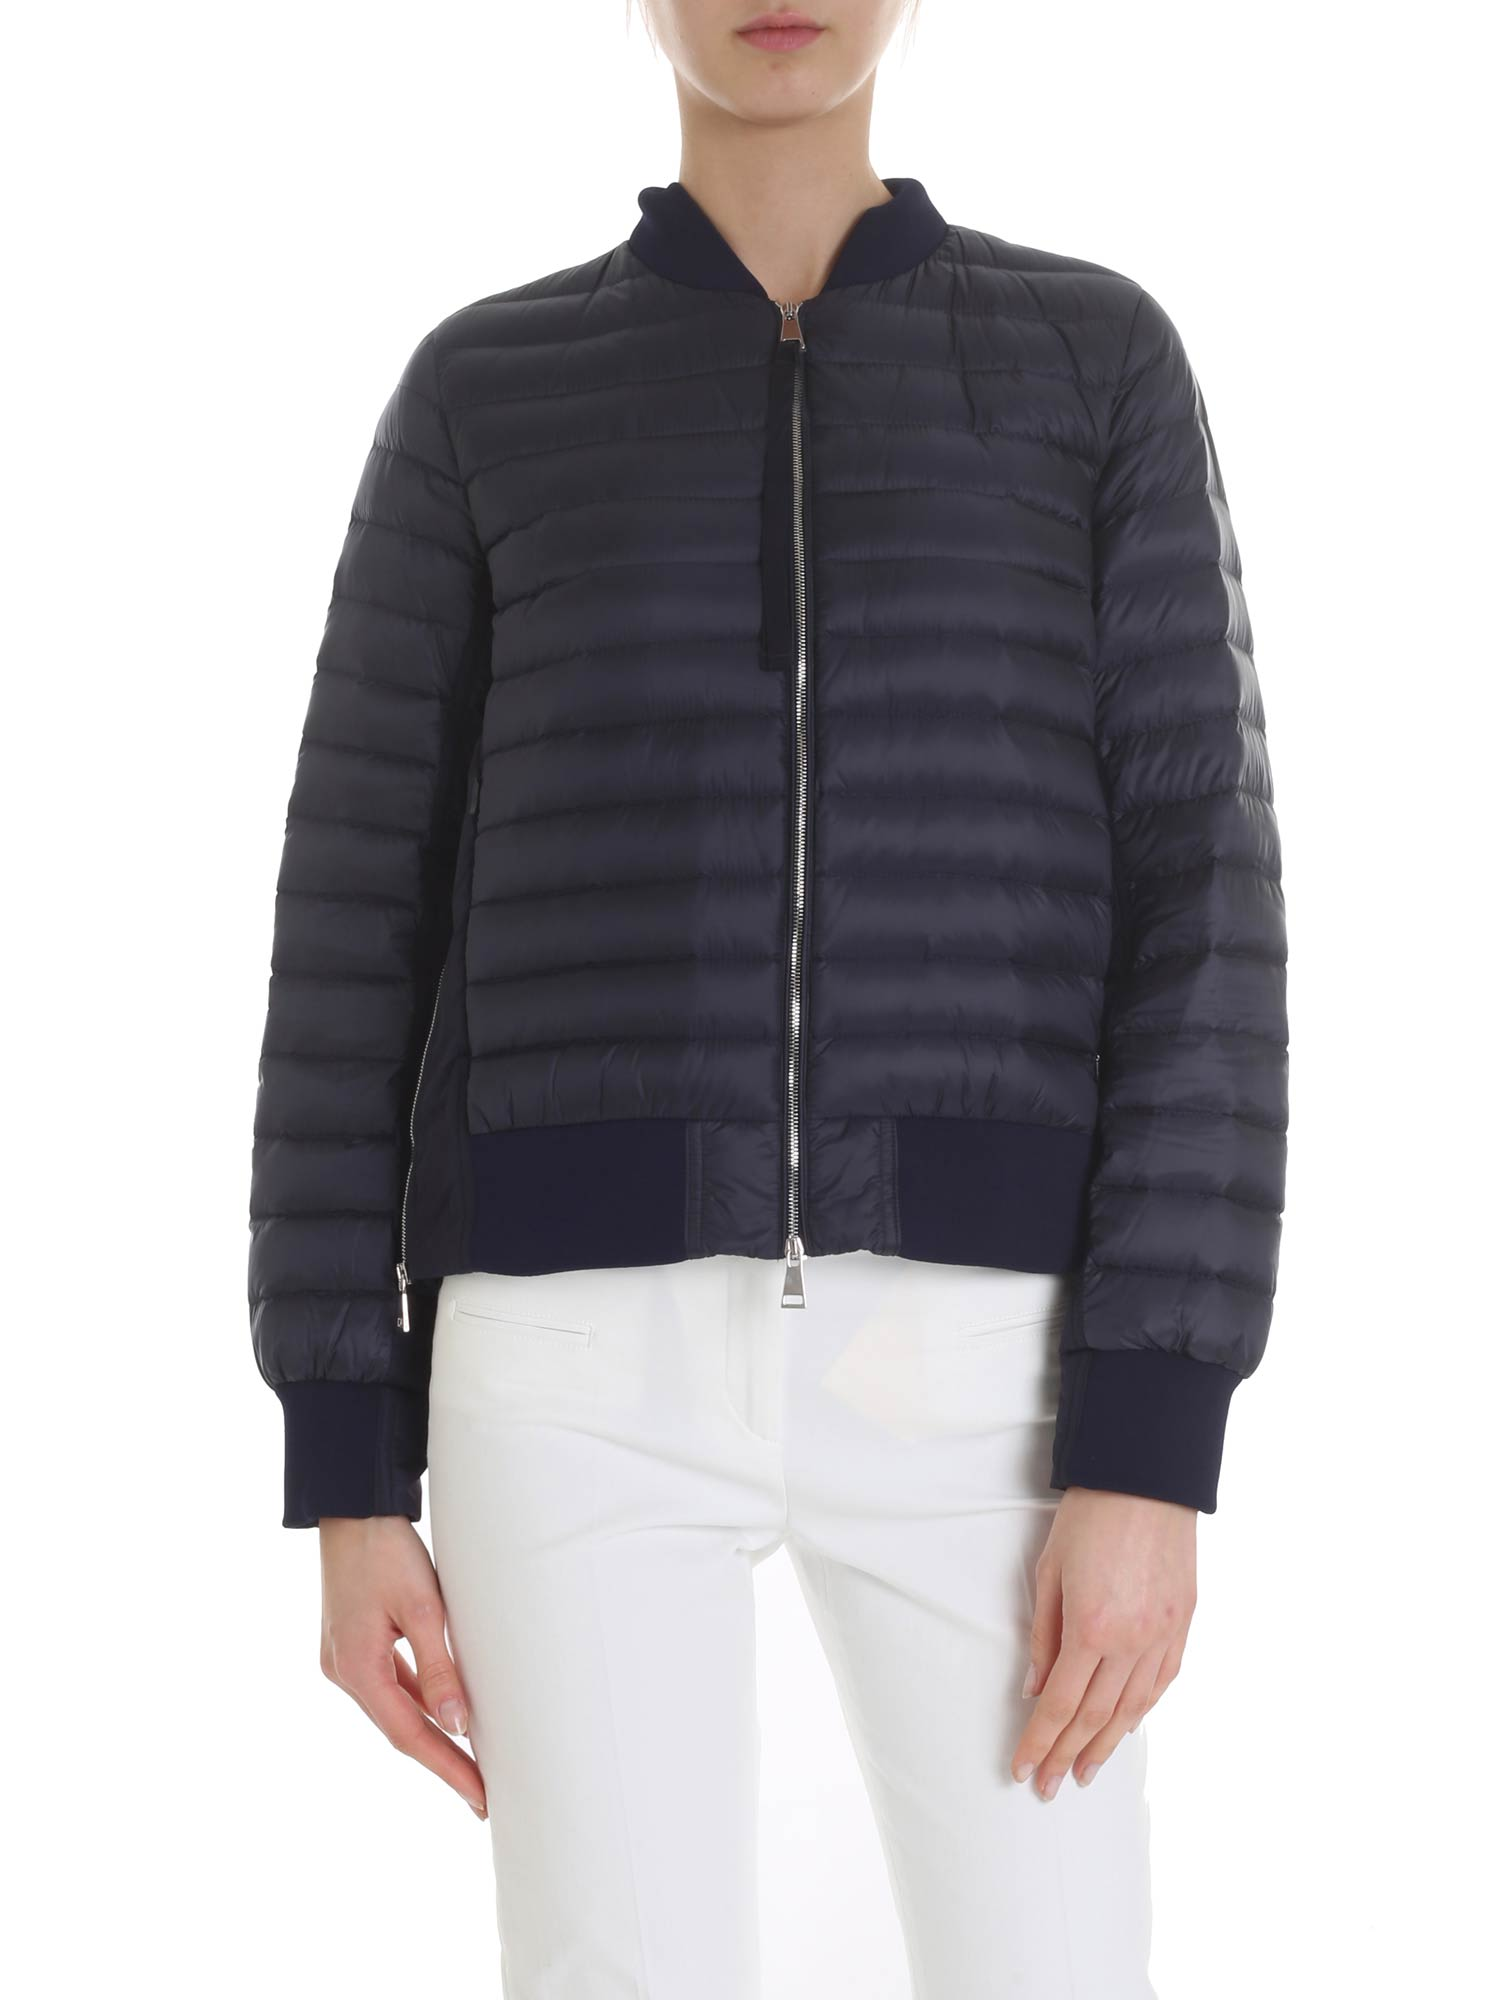 Moncler – Rome Down Jacket